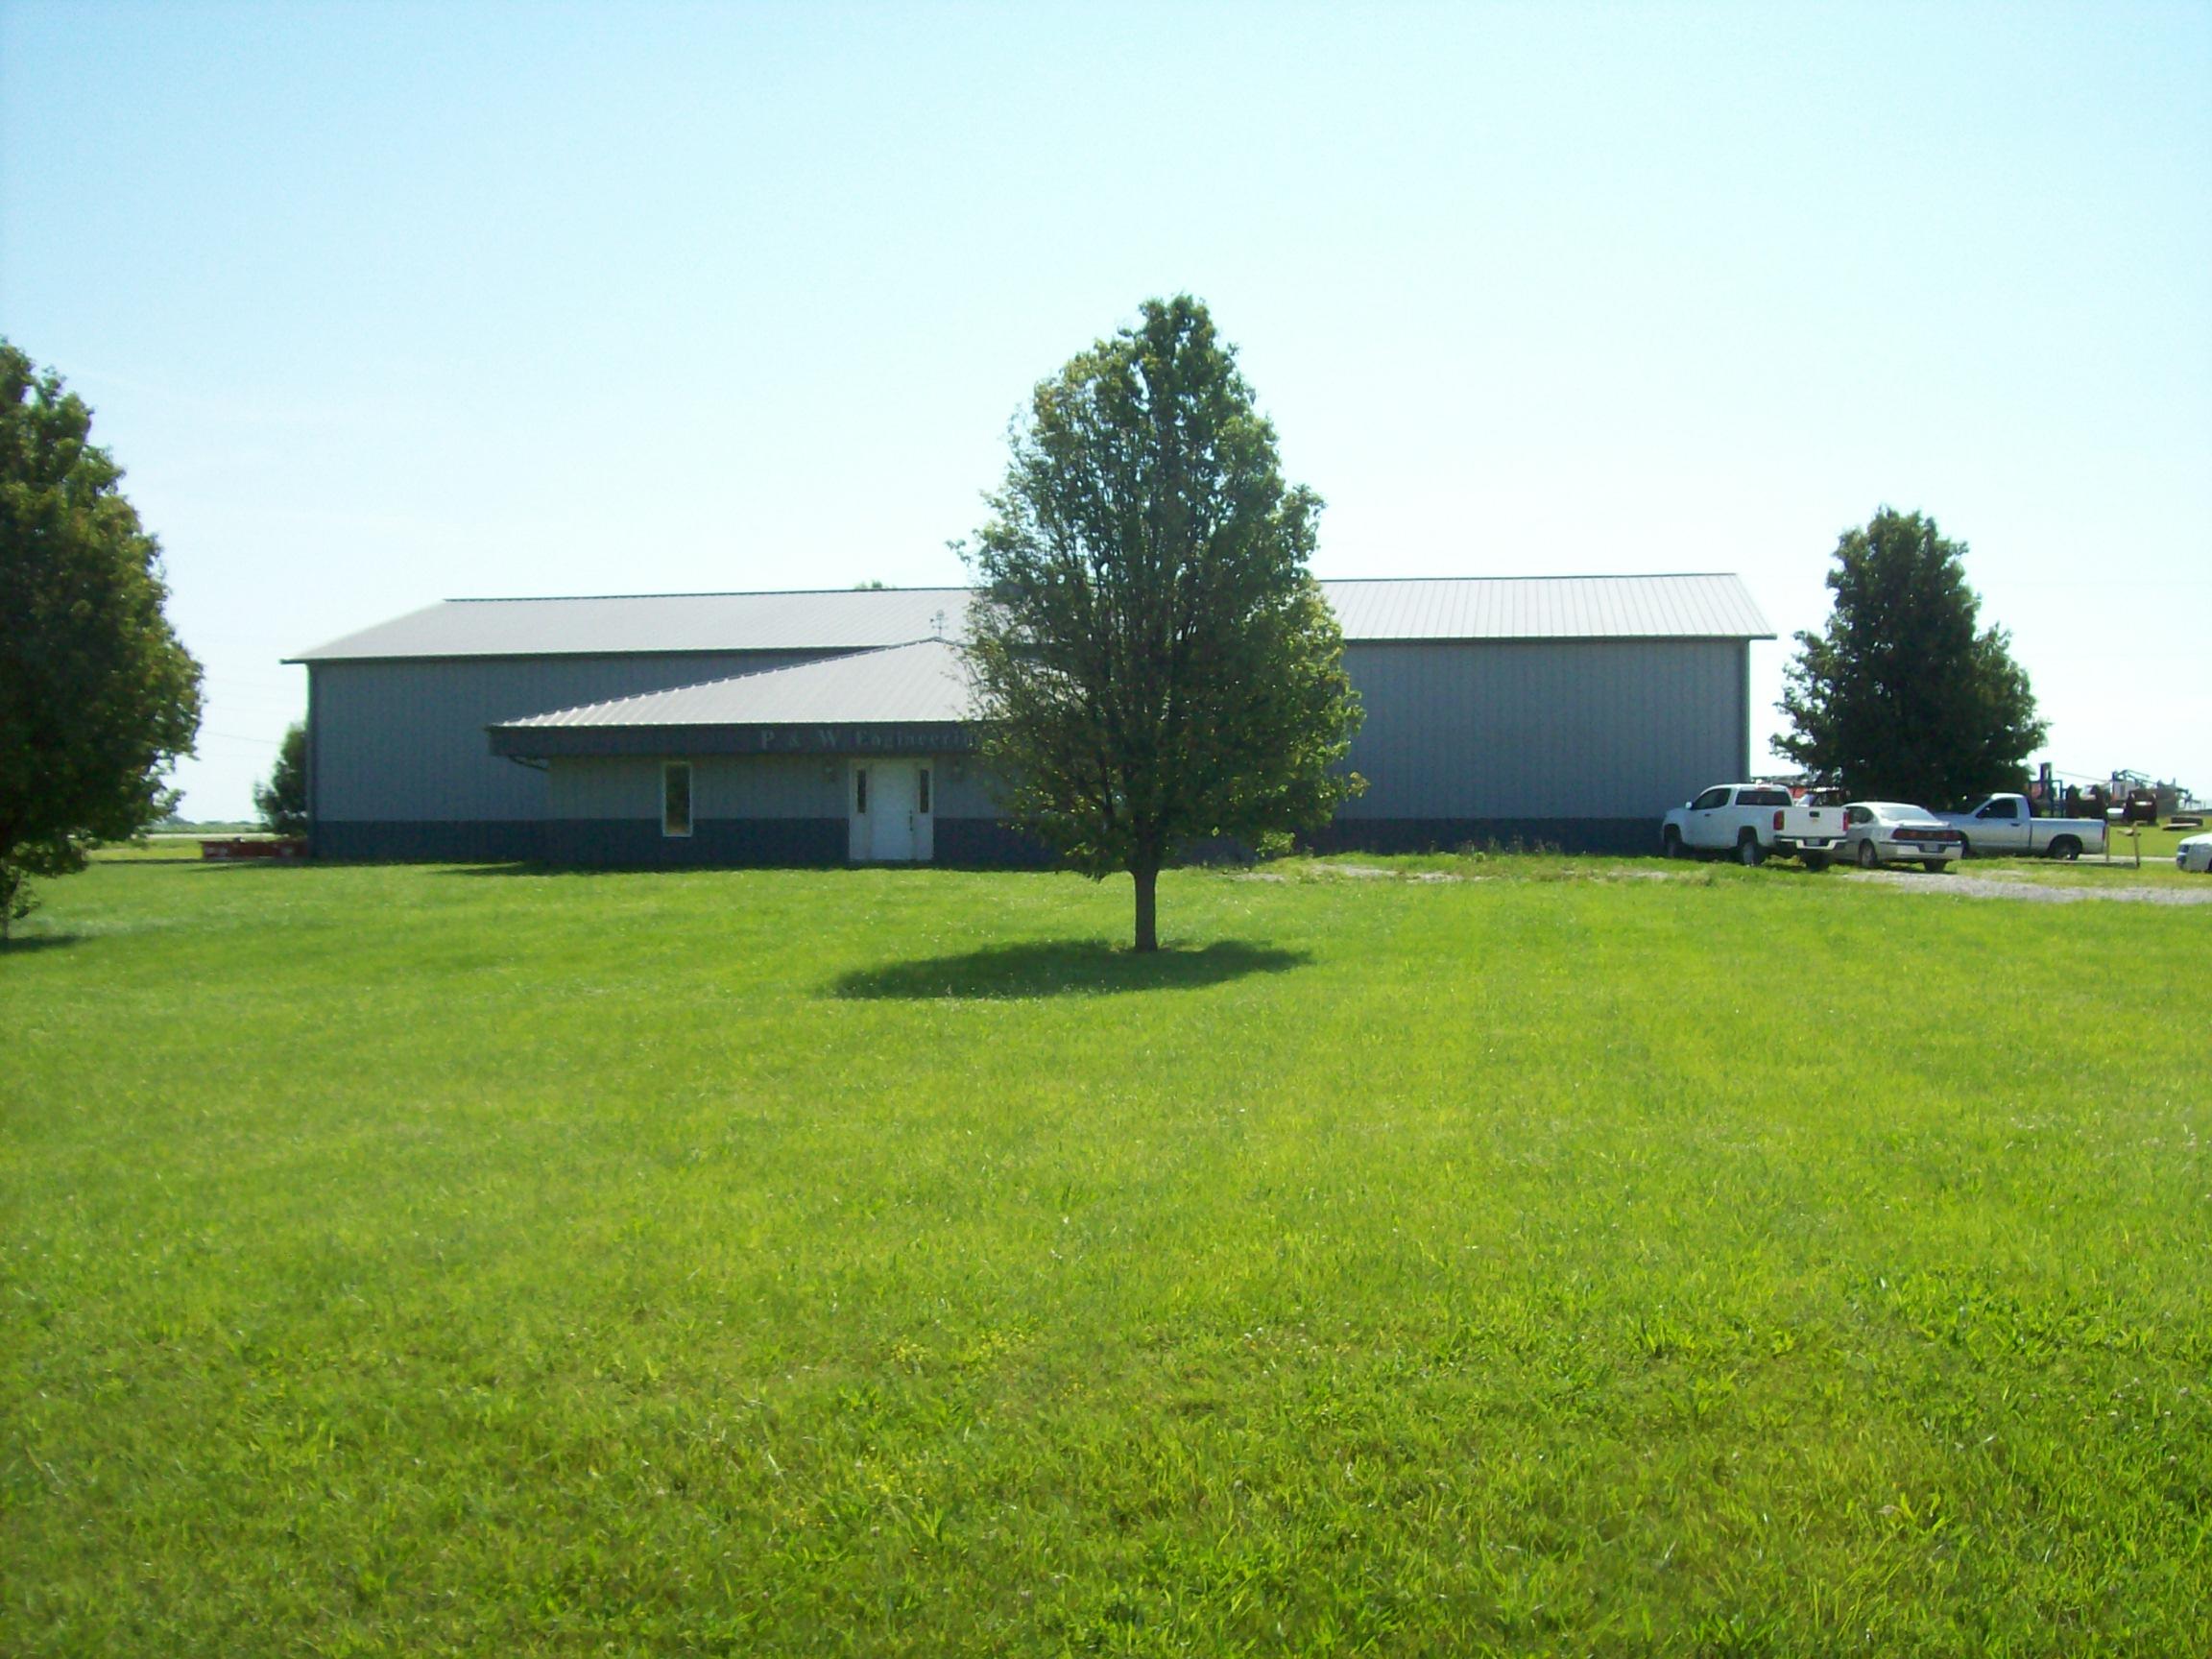 110 Tori Lane, Sedalia, Missouri 65301